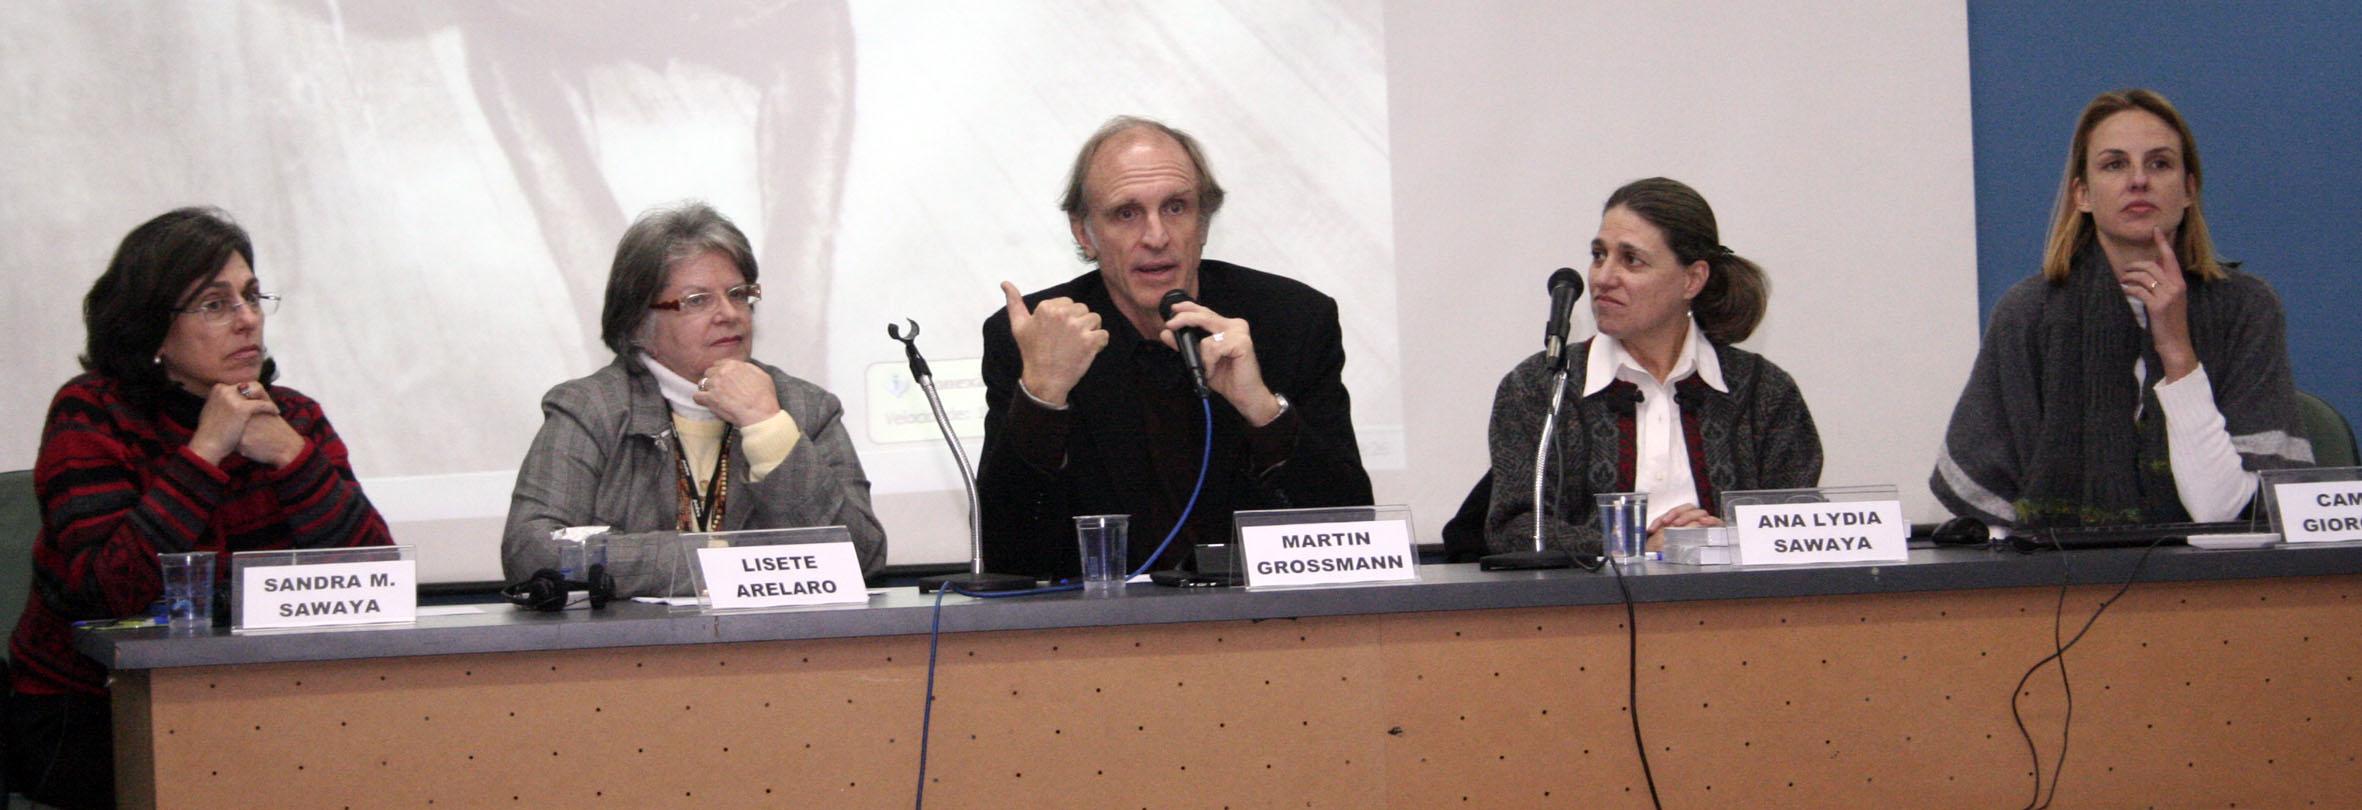 Sandra Sawaya, Lisete Arelano, Martin Grossmann, Ana Lydia Sawaya e Camila Giorgetti